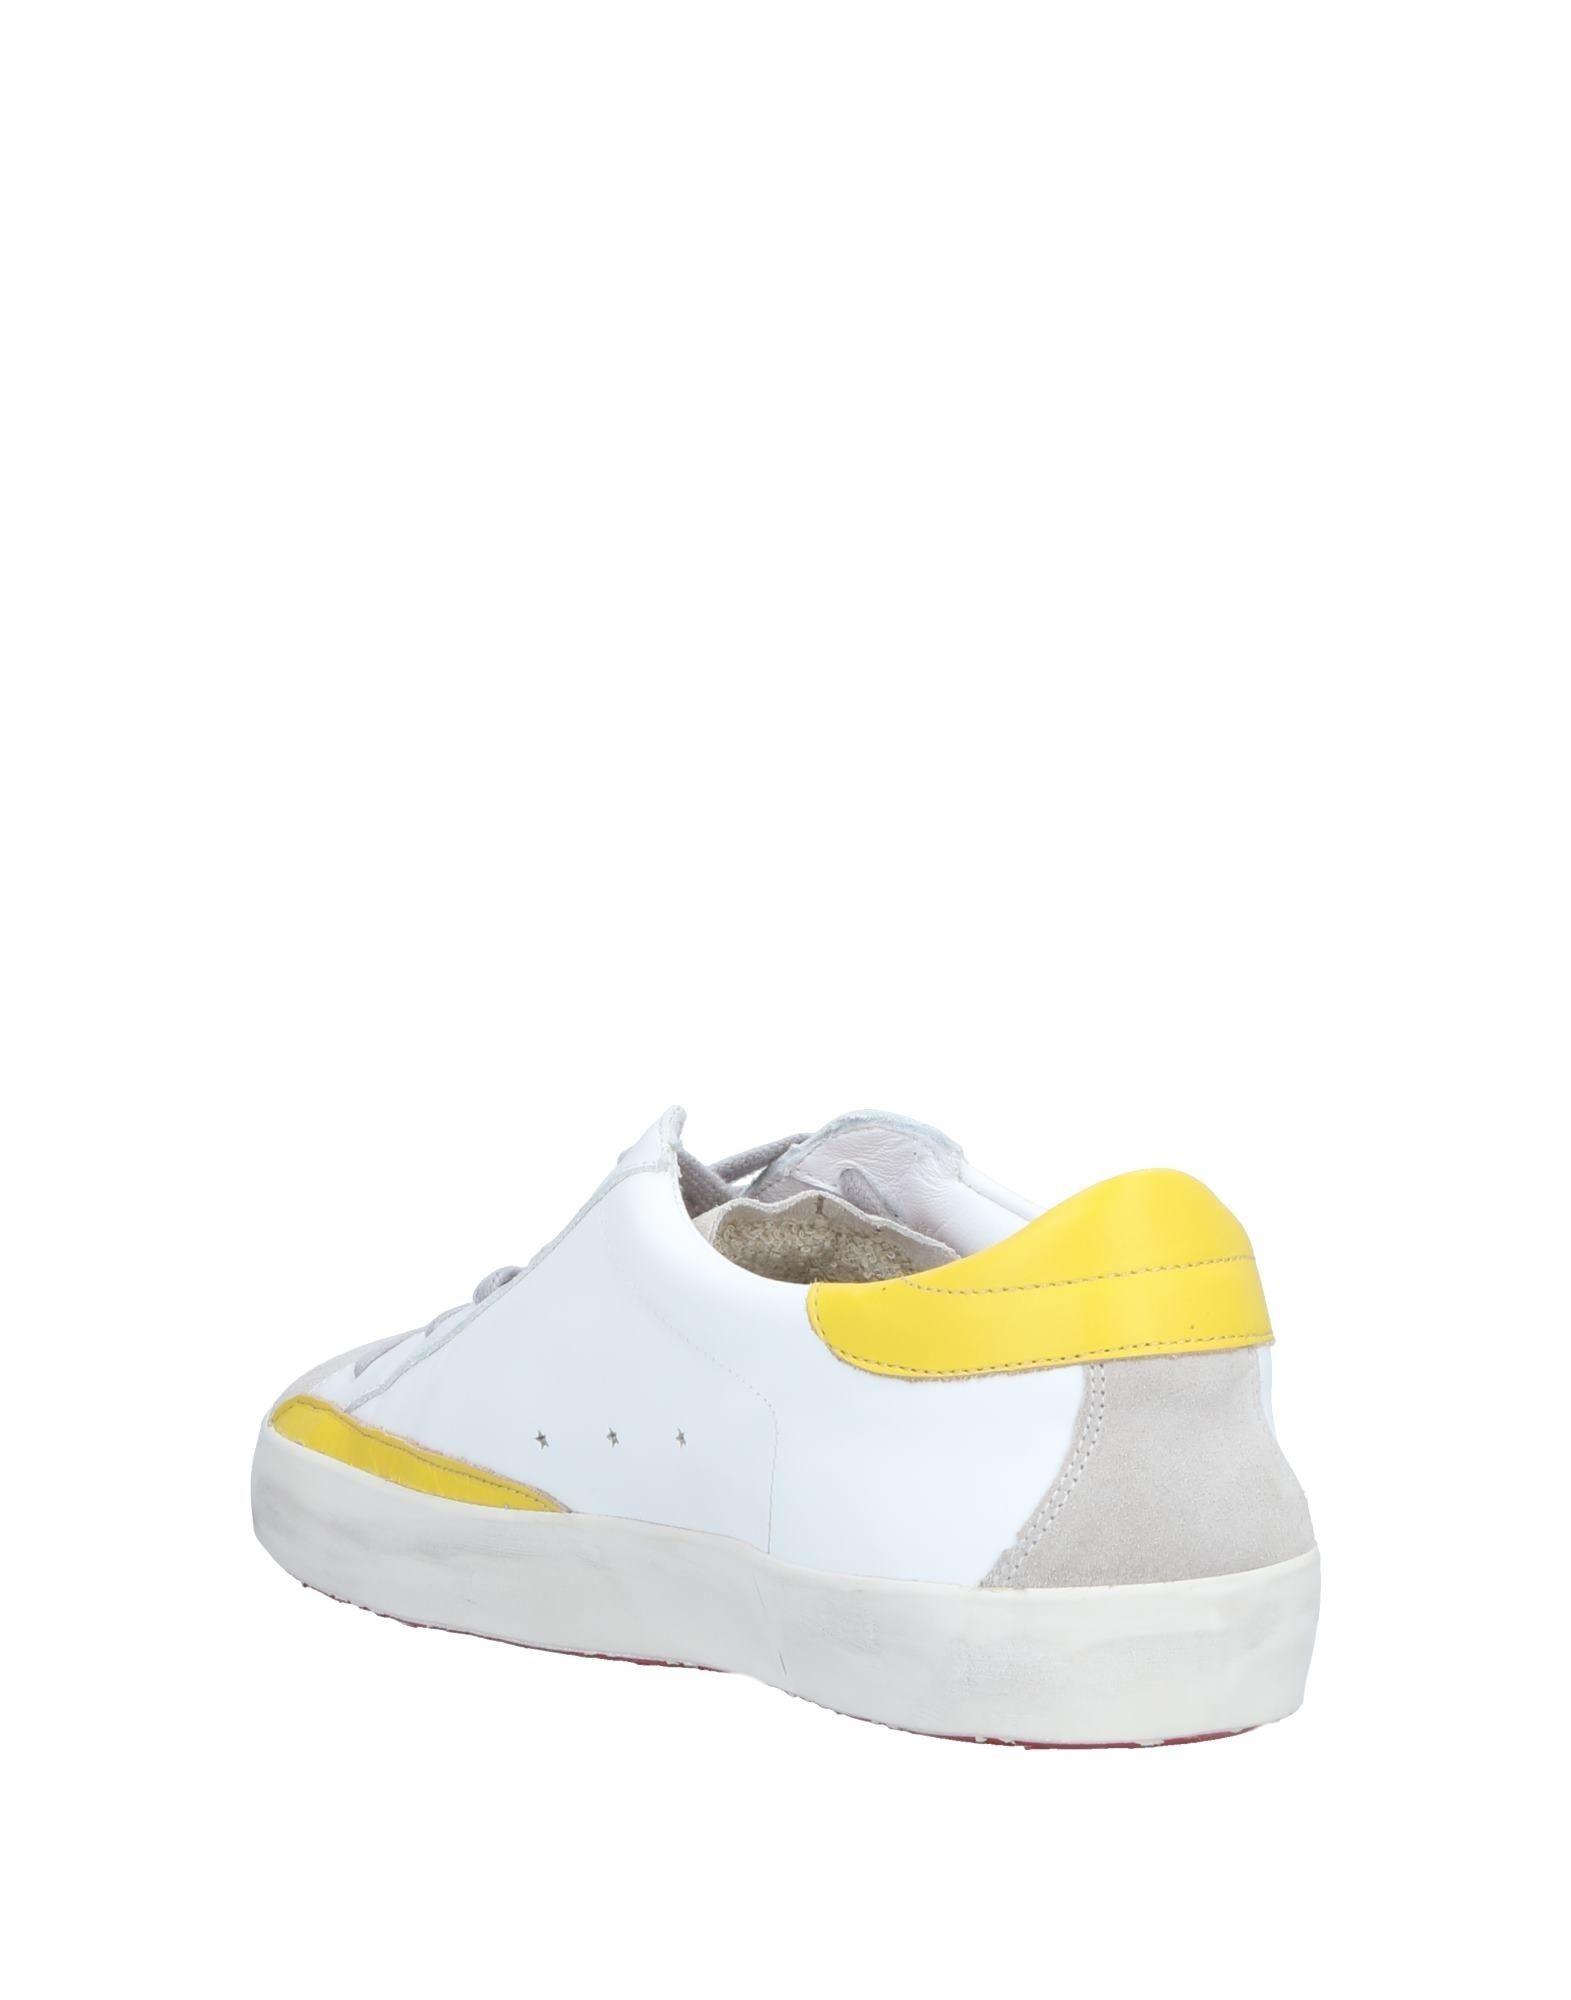 Ishikawa Sneakers - Men Ishikawa Sneakers Sneakers Sneakers online on  Australia - 11543898WK 3f873a